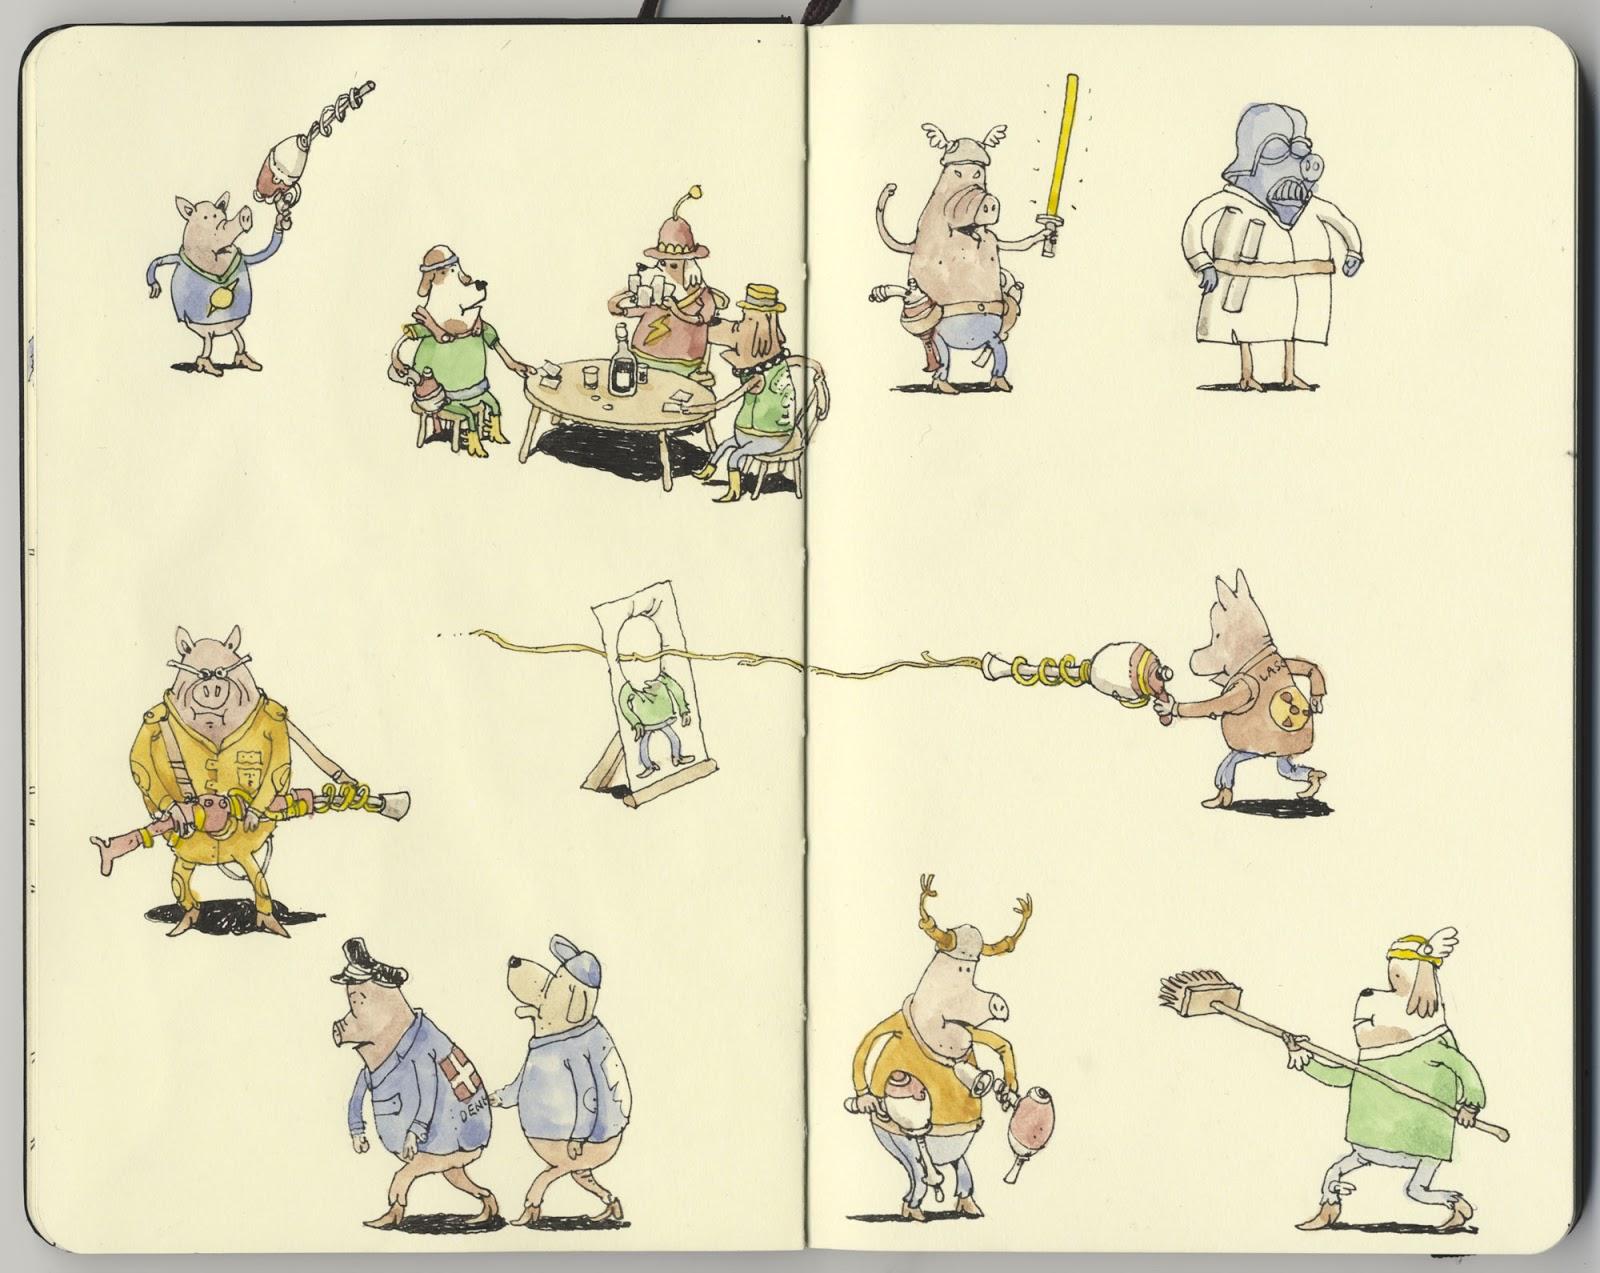 Mattias Adolfsson sketch illustration 2